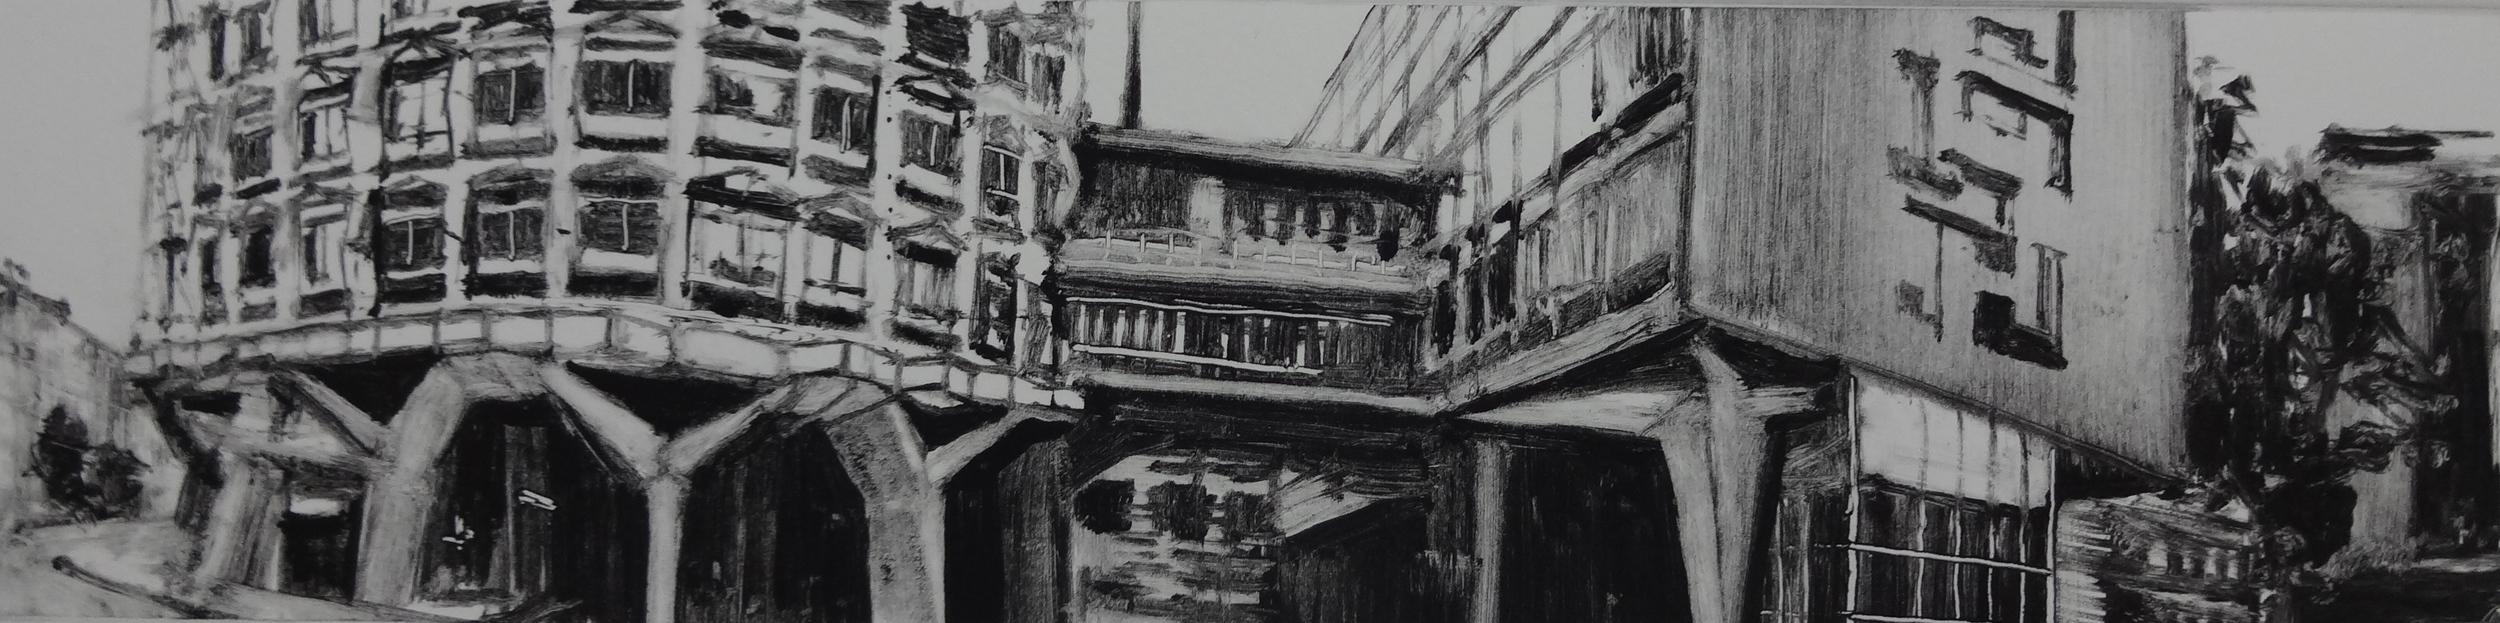 Monotype Kemble St London 7.5 x 29.5 cm.JPG